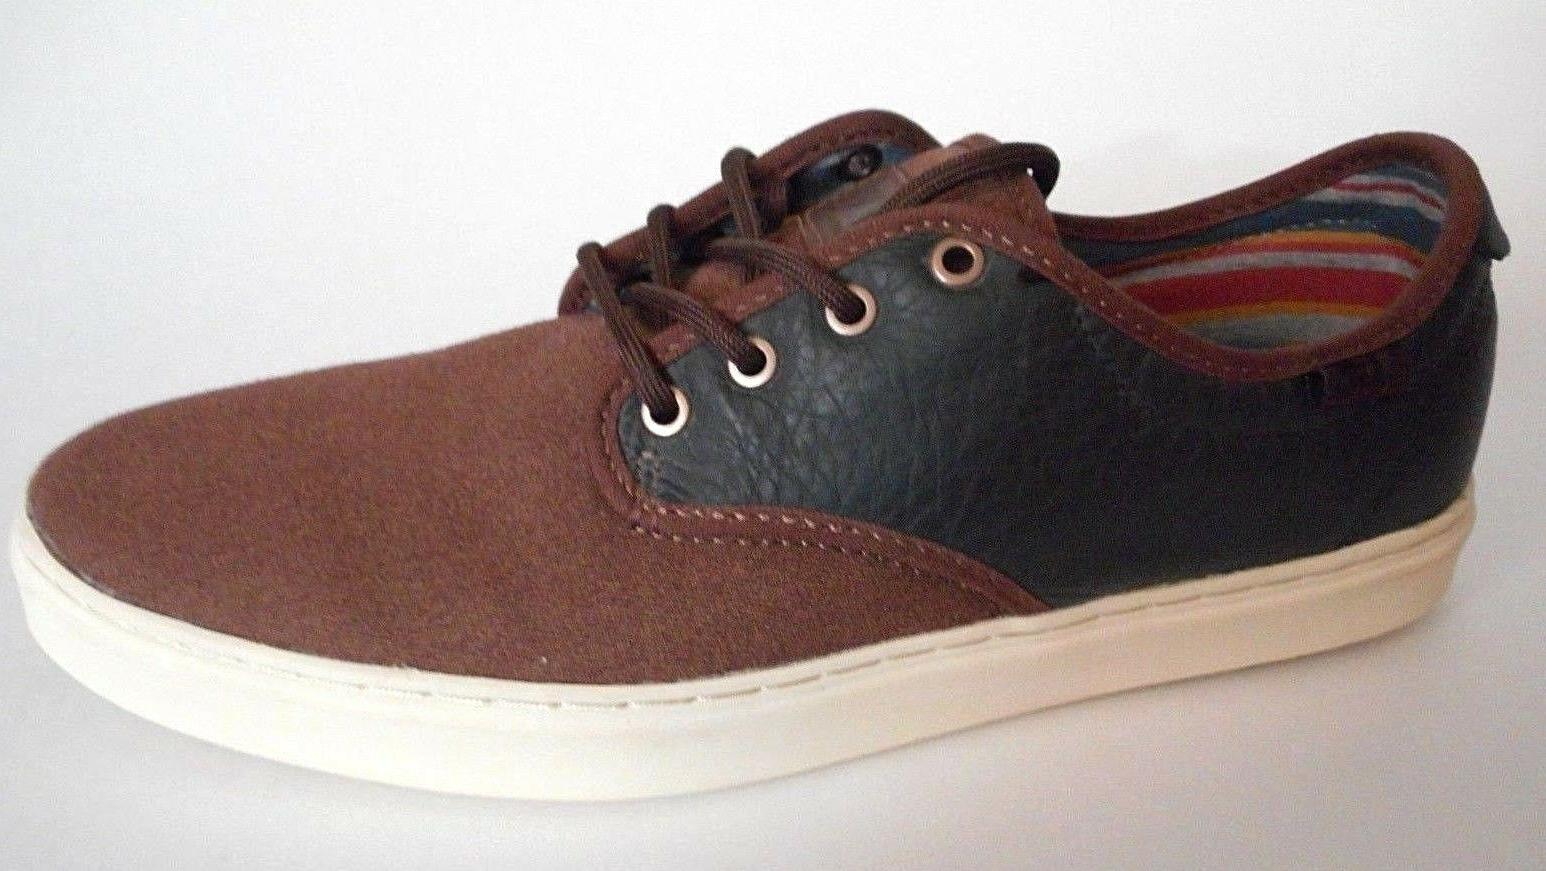 brand new size 9 brown antique black